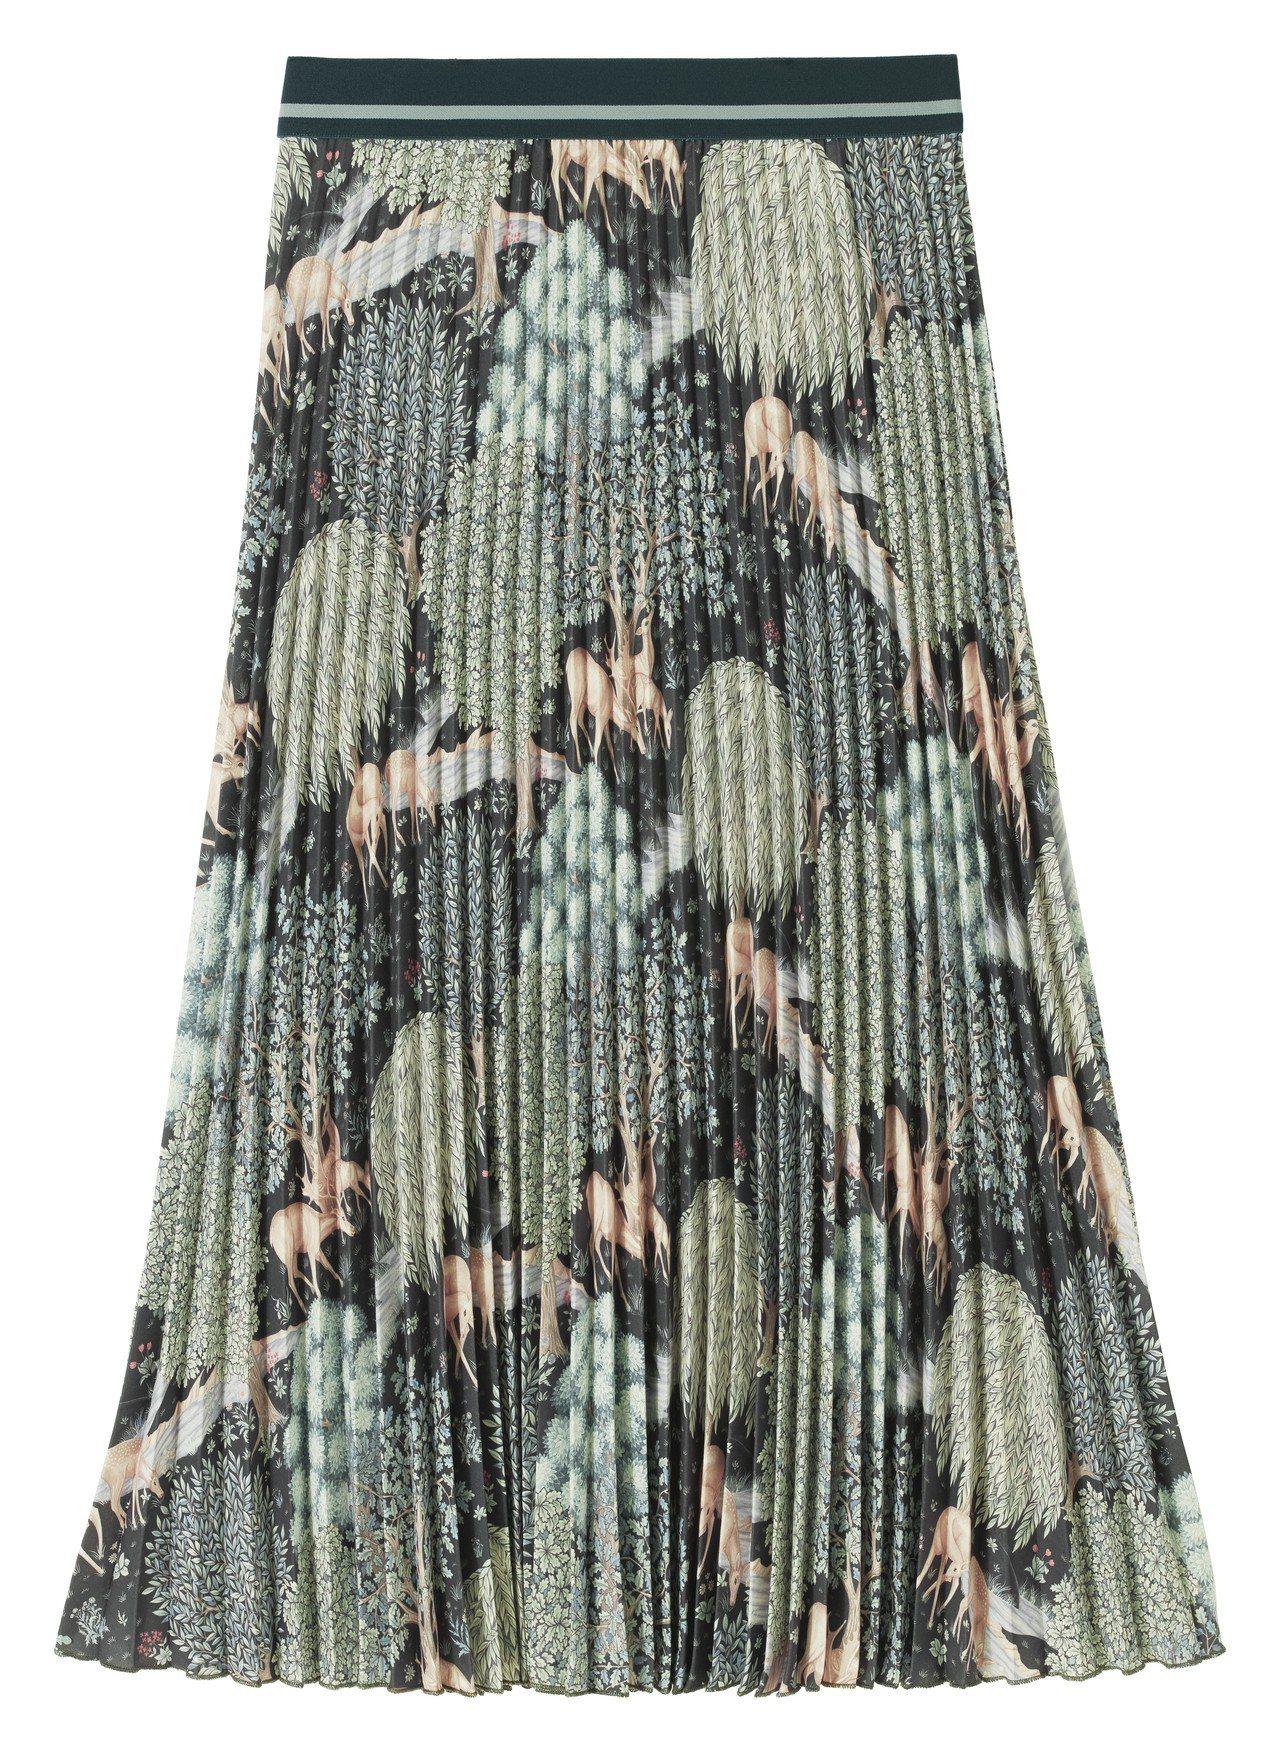 Morris&Co.與H&M聯名系列女裝摺裙,1,699元。圖/H&M提供